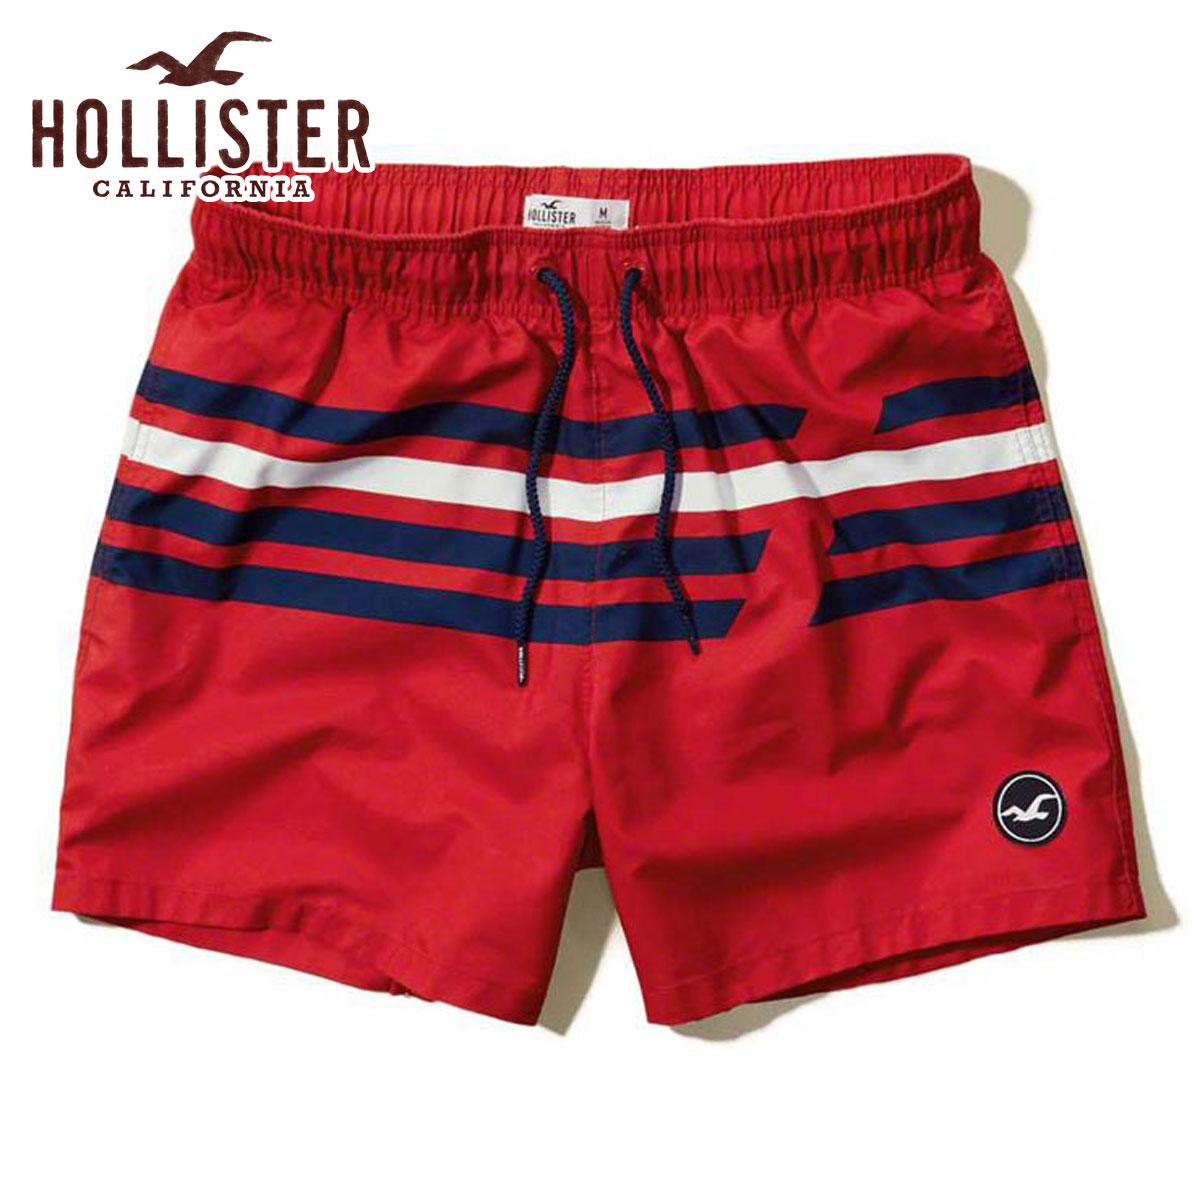 874e5b0b2da24 Hori star HOLLISTER regular article men swimming underwear swimsuit Stripe  Guard Fit Swim Shorts 333- ...